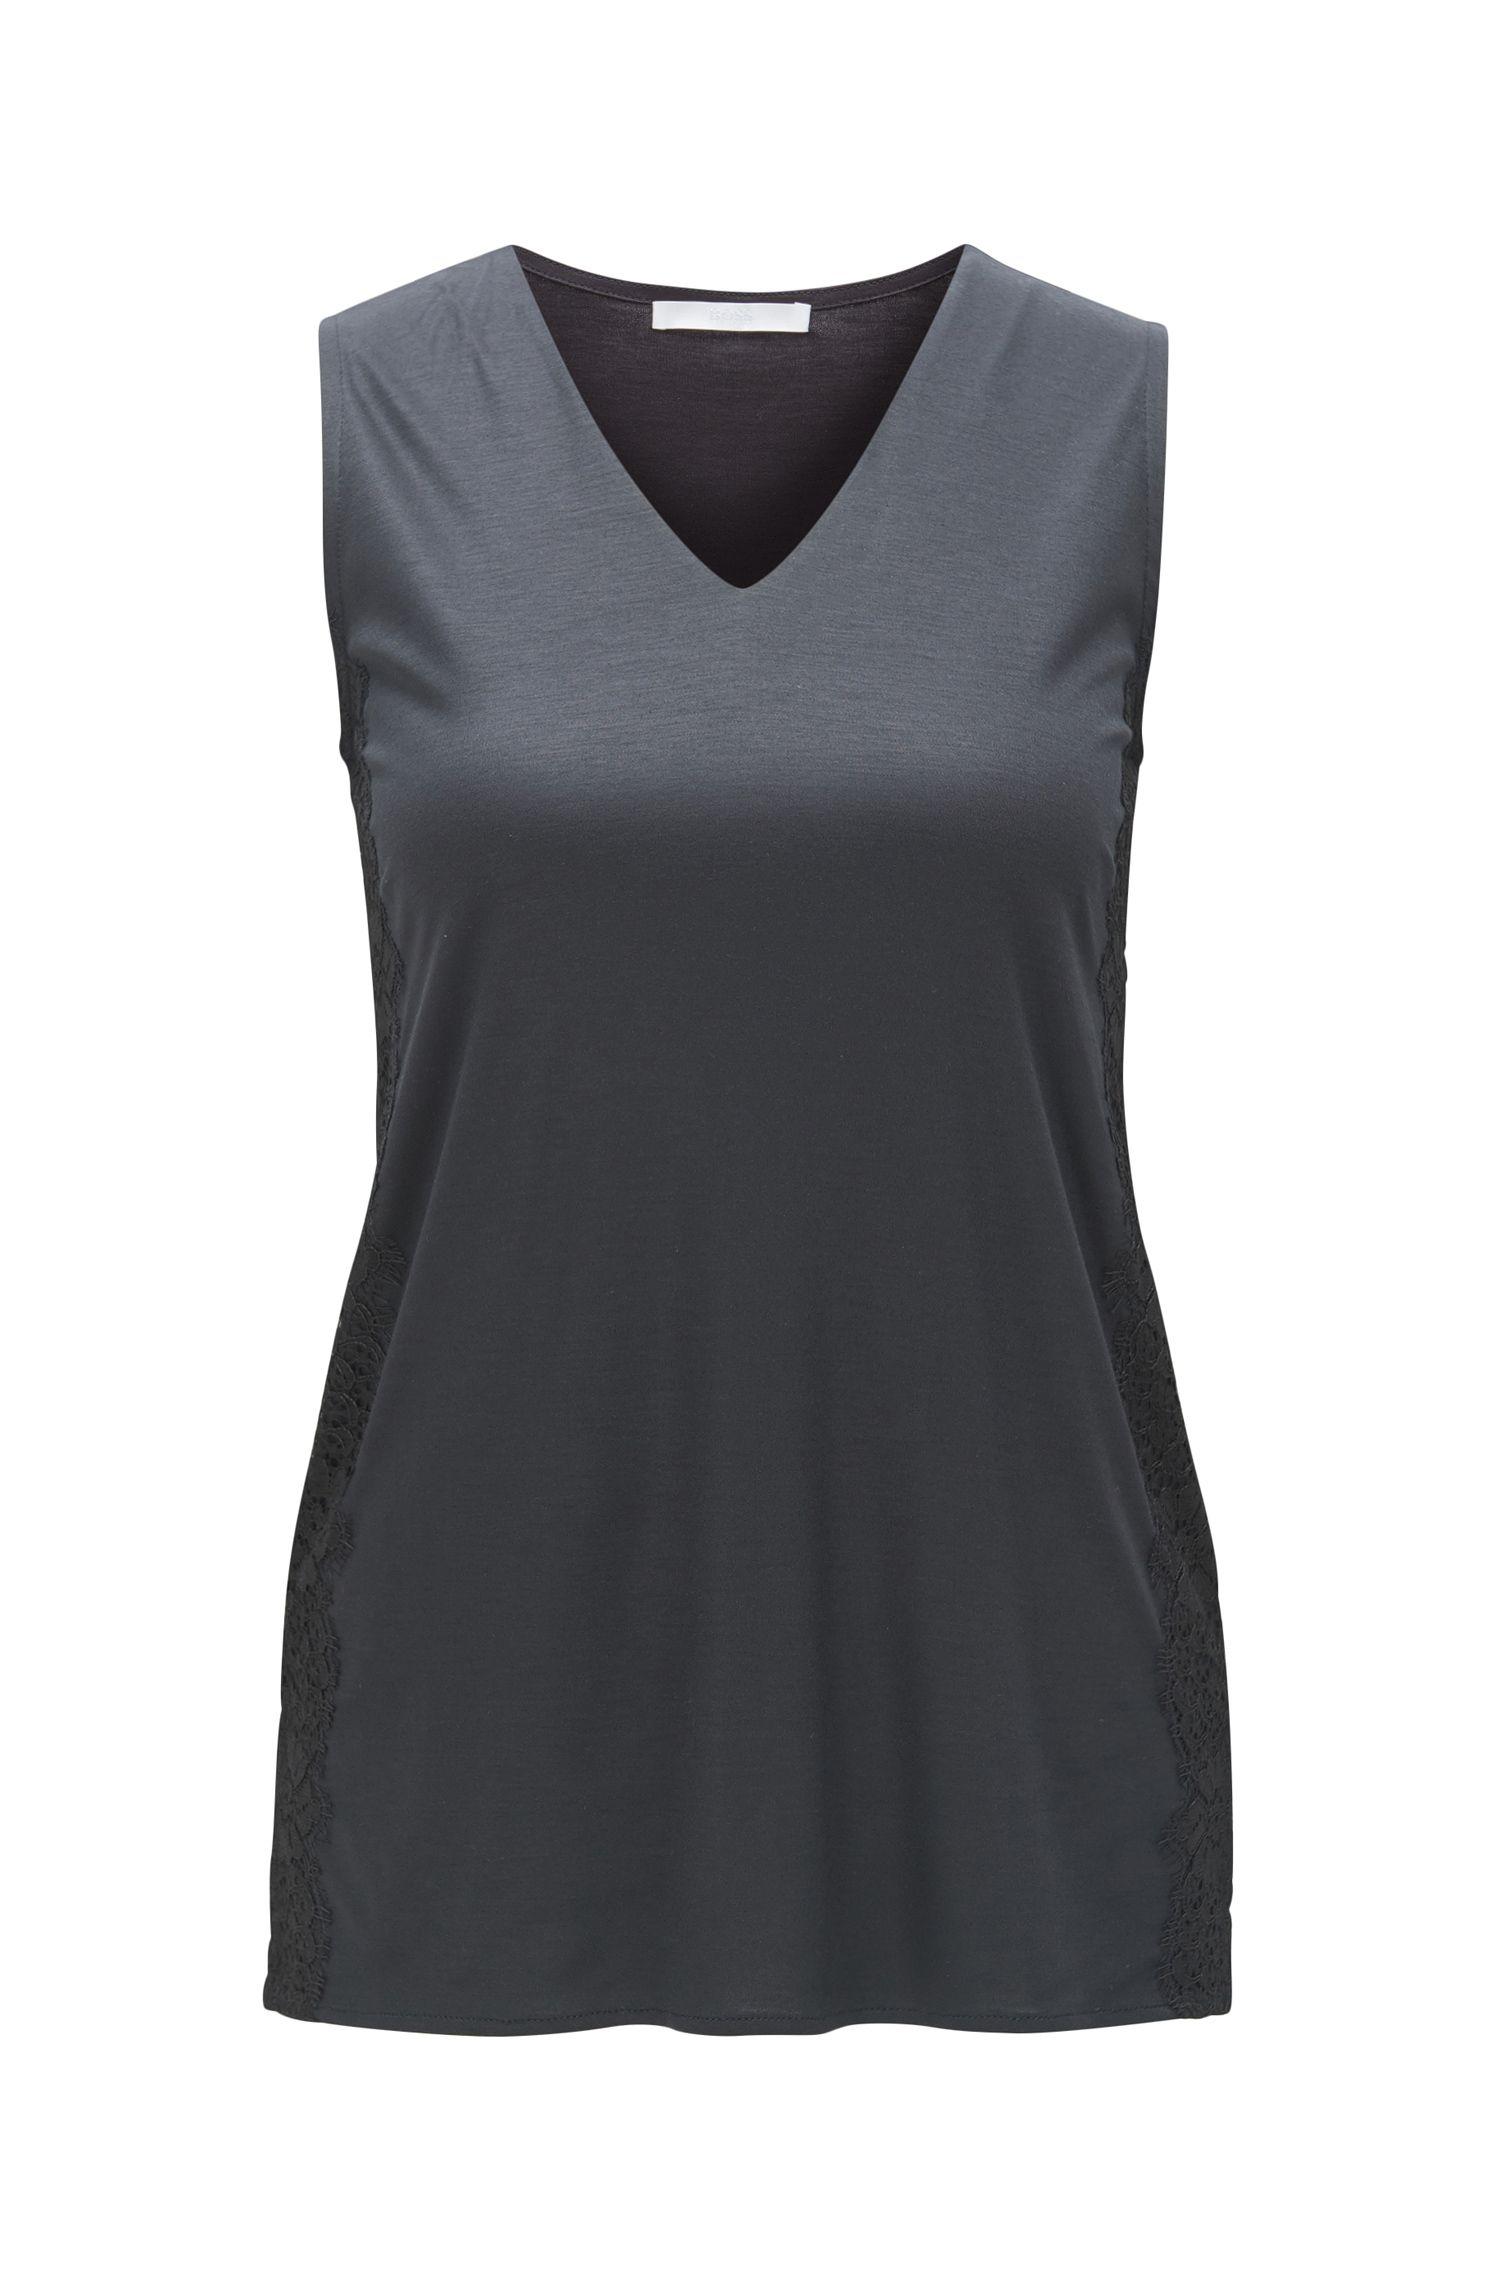 Lace-Trim Modal Top | Ellita